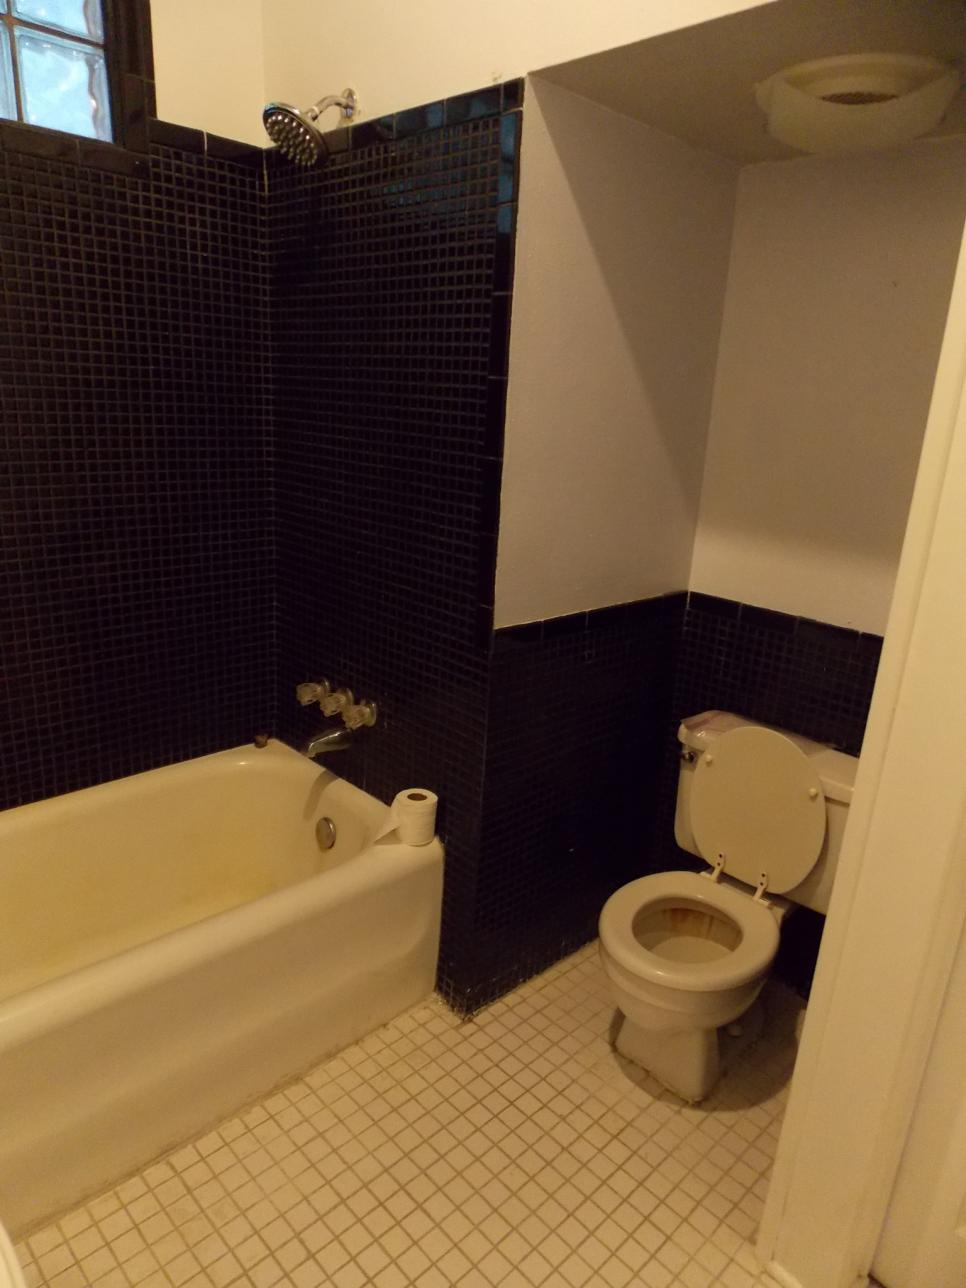 HFXUP105H_muska-bathroom-before-122308_331068_v.jpg.rend.hgtvcom.966.1288